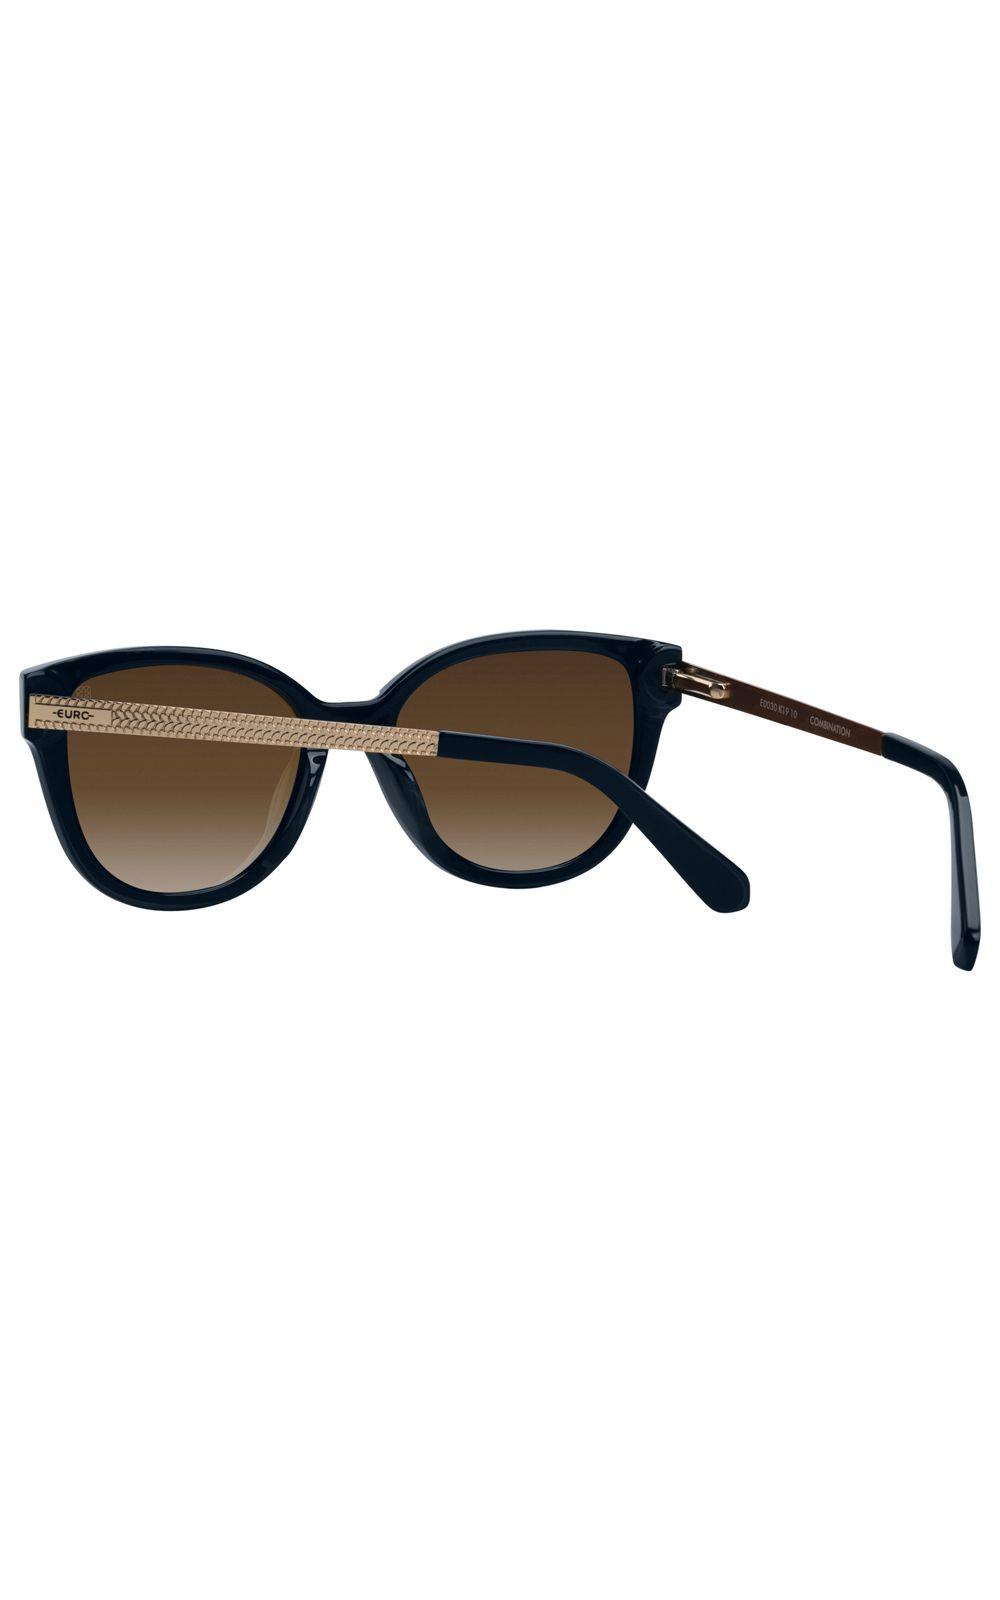 Foto 2 - Óculos Euro Unique Front Dourado E0041K1910/4D